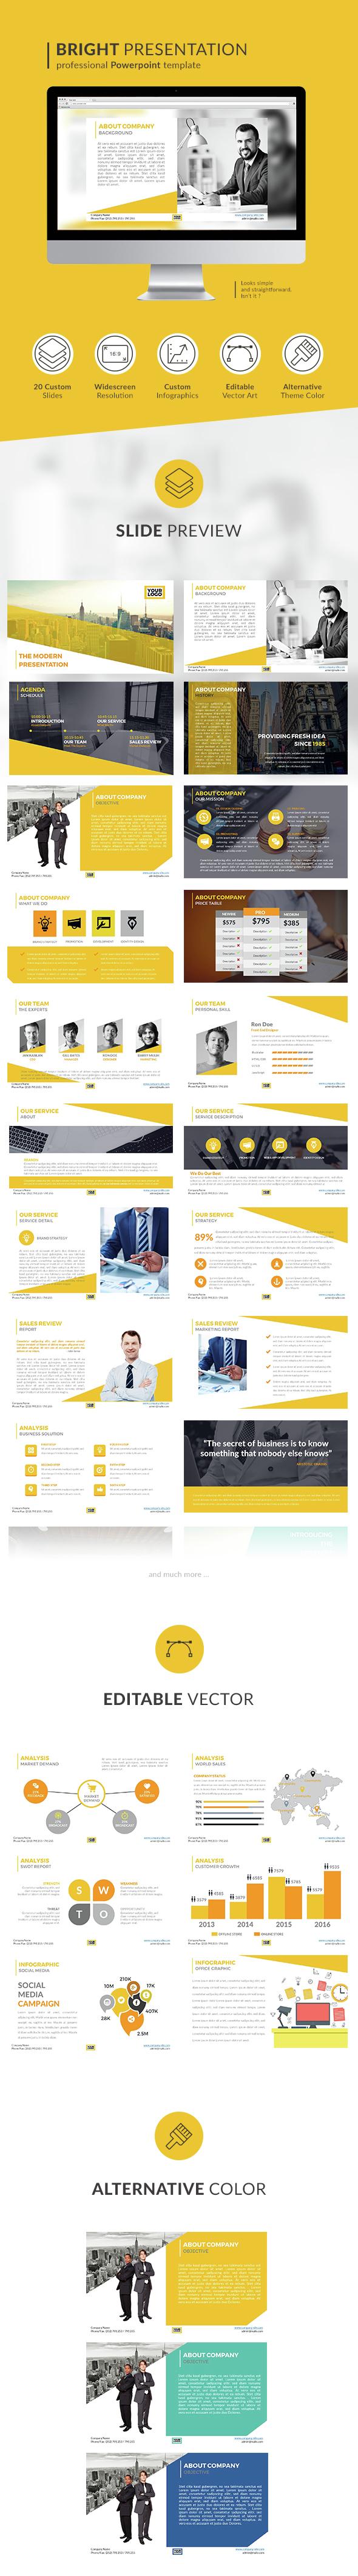 Modern Bright Presentation - Business PowerPoint Templates